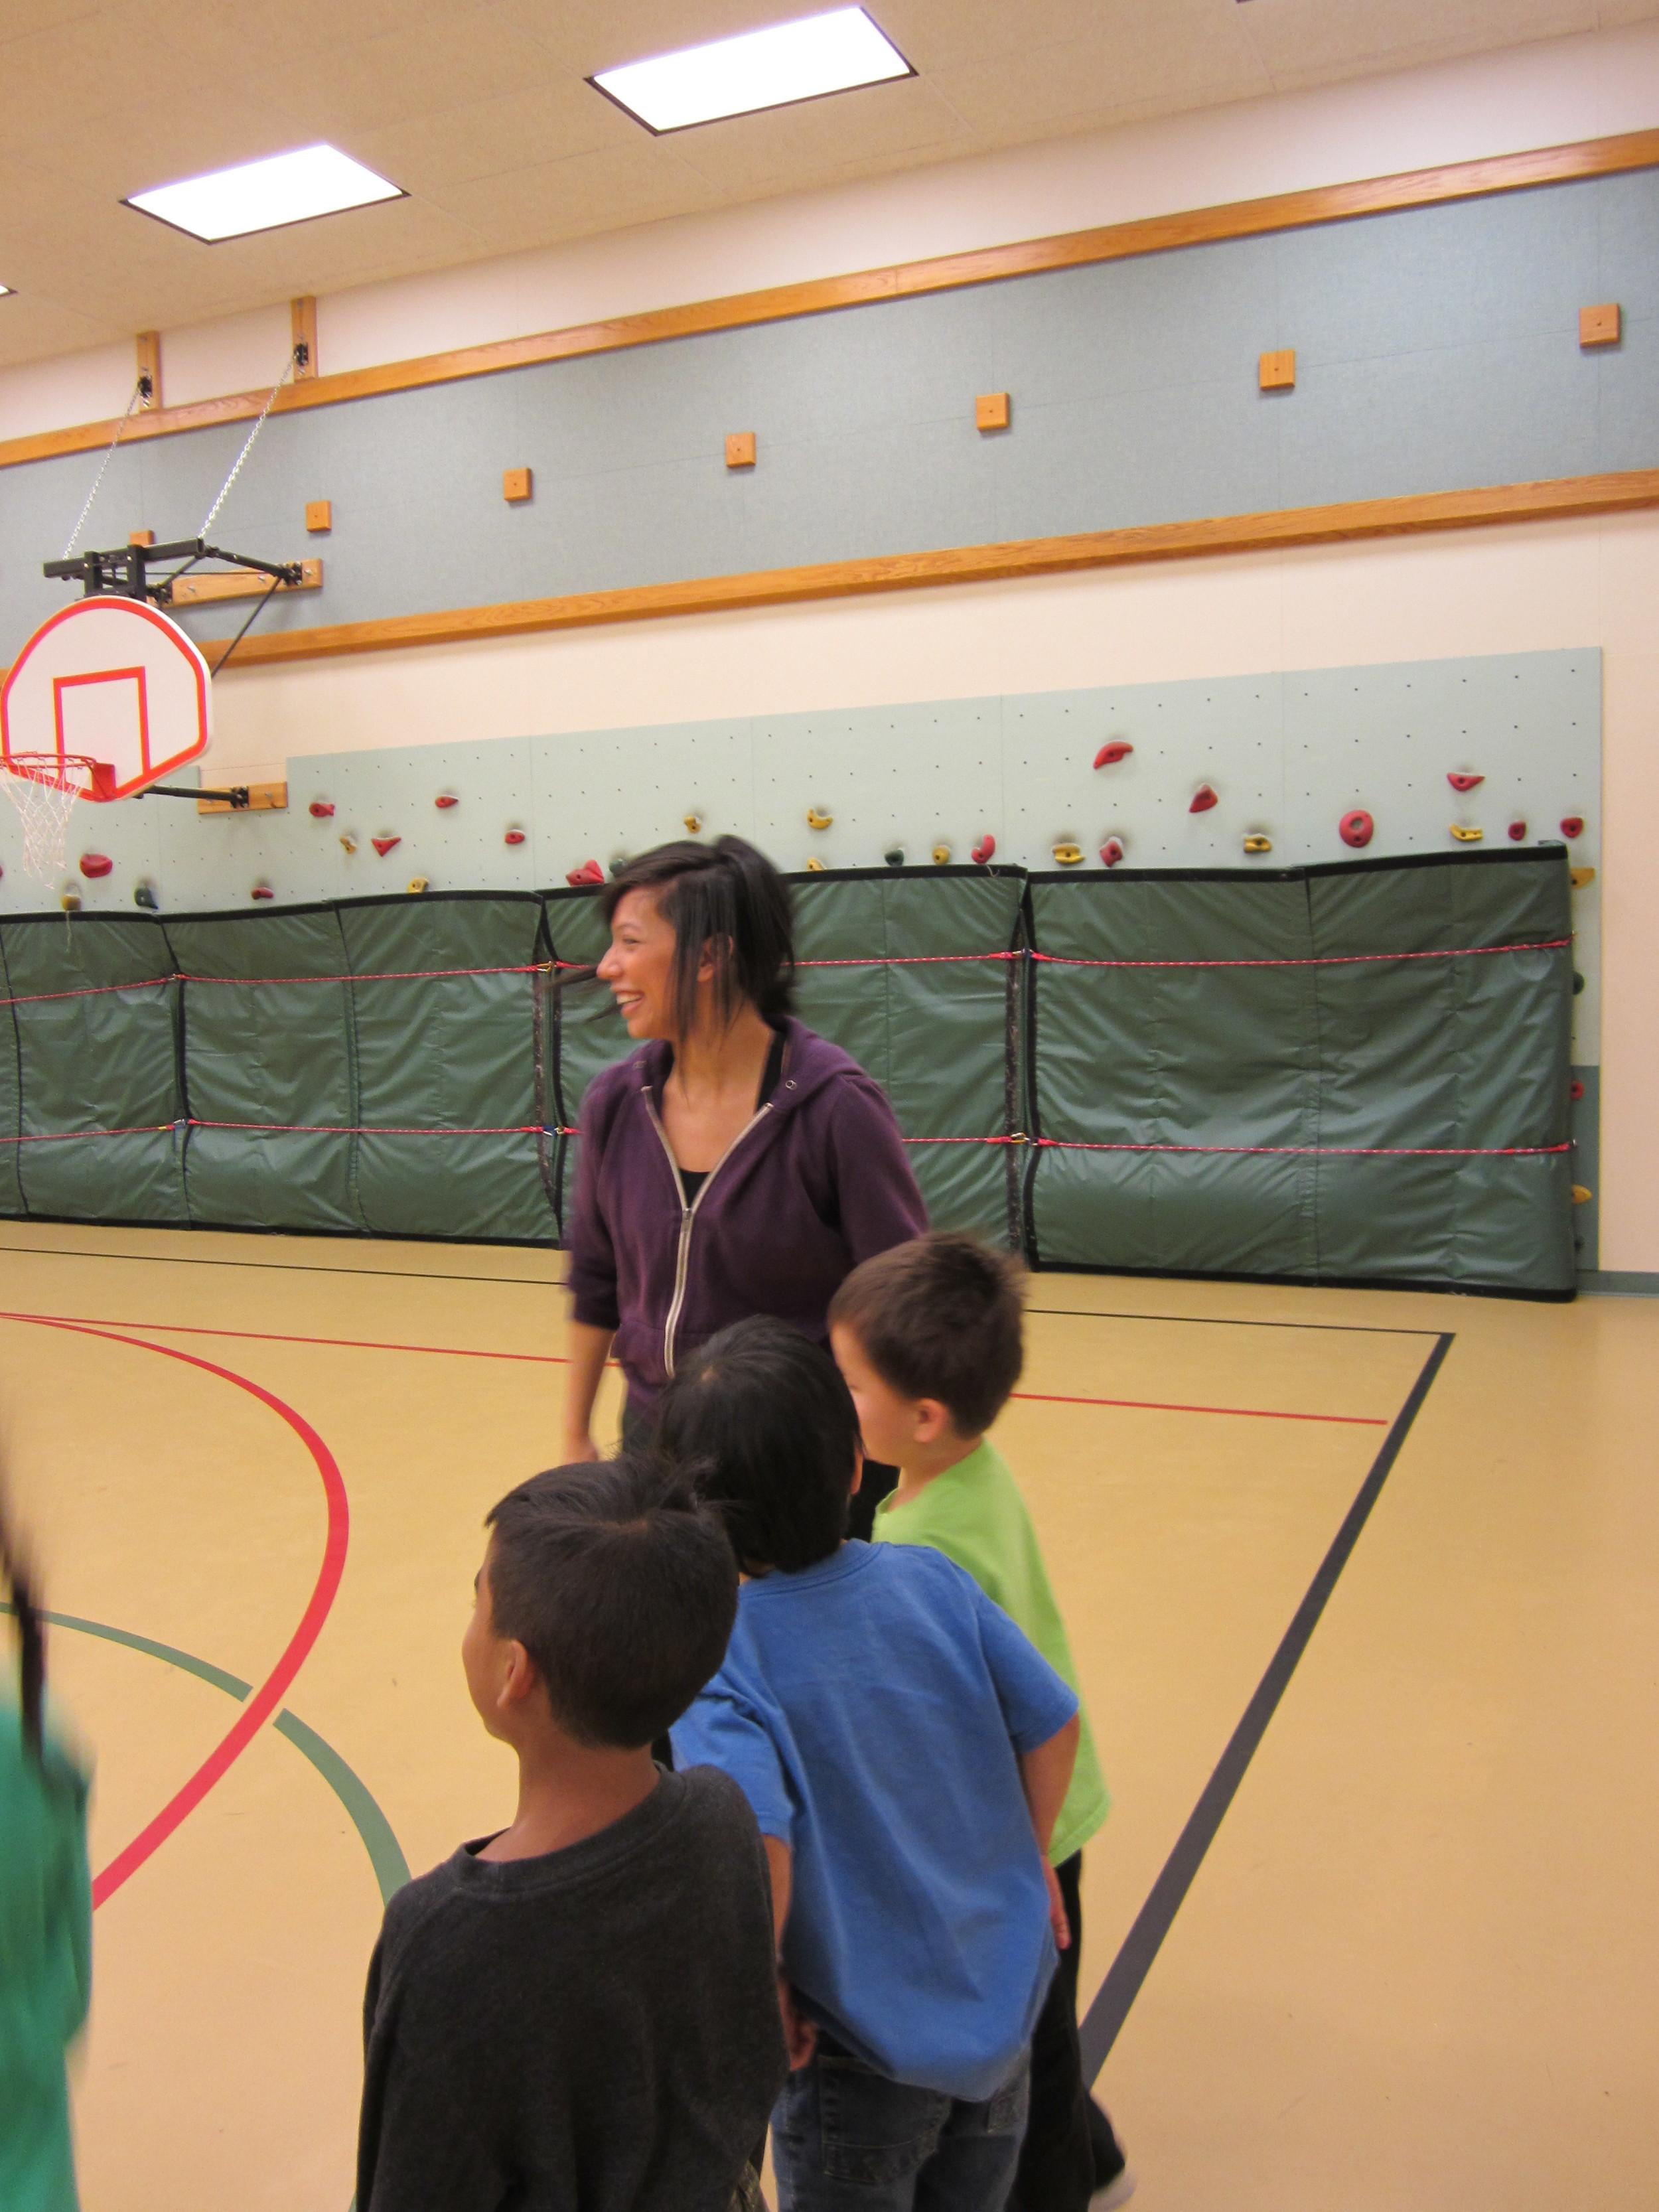 Irenerose at Ptarmigan Elementary